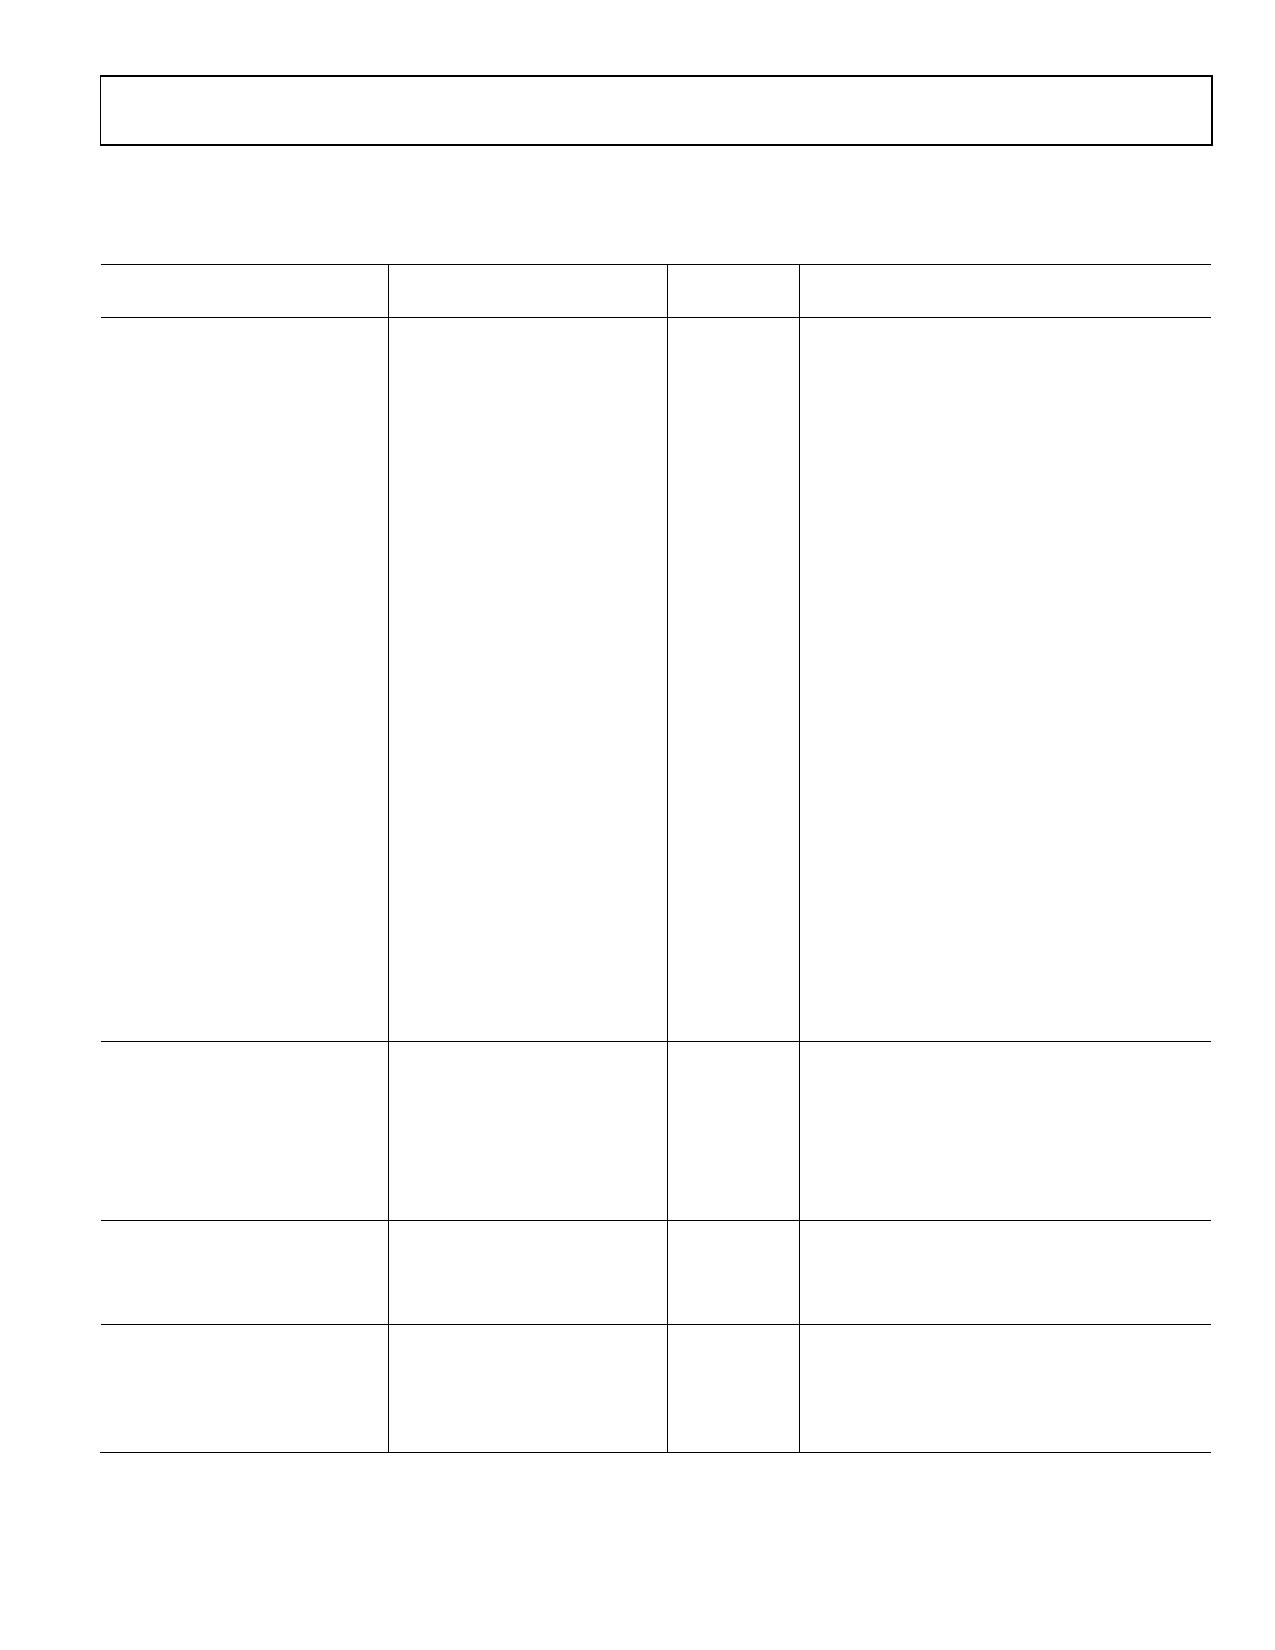 AD5664R pdf, arduino